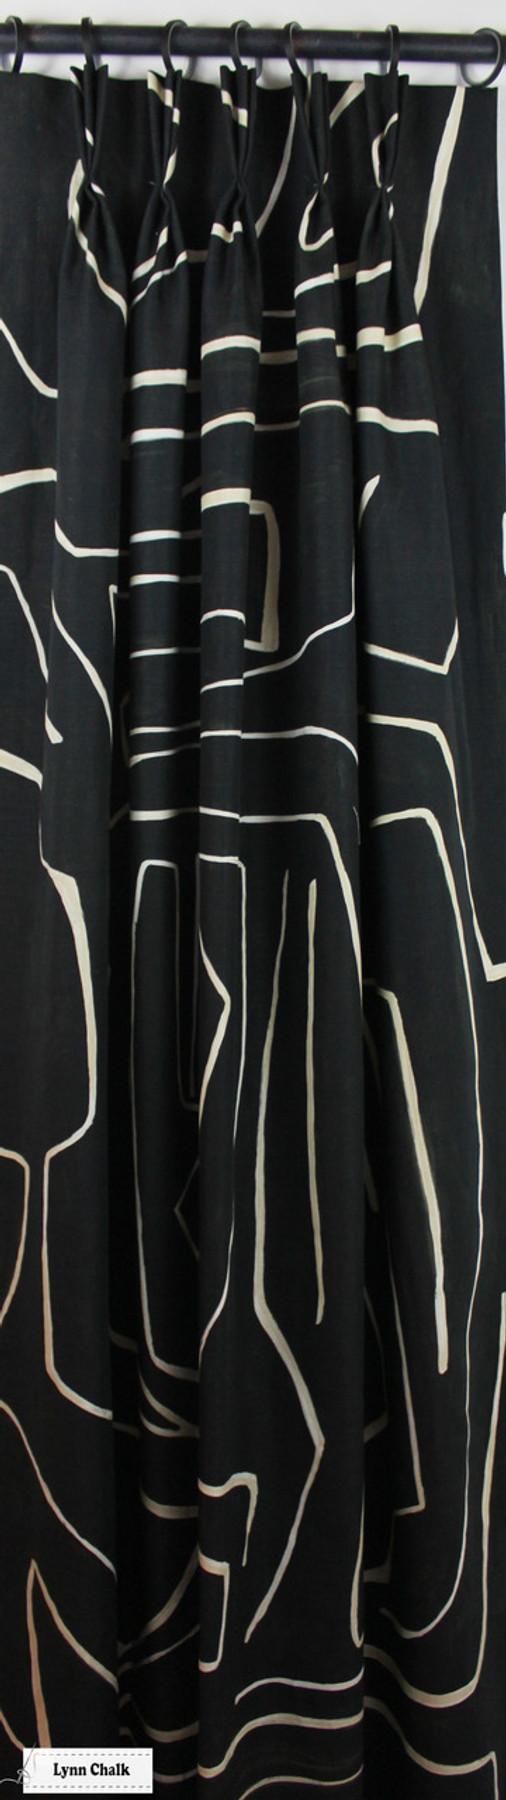 Kelly Wearstler for Lee Jofa Graffito Drapes (shown in Salmon/Cream-comes in several colors)